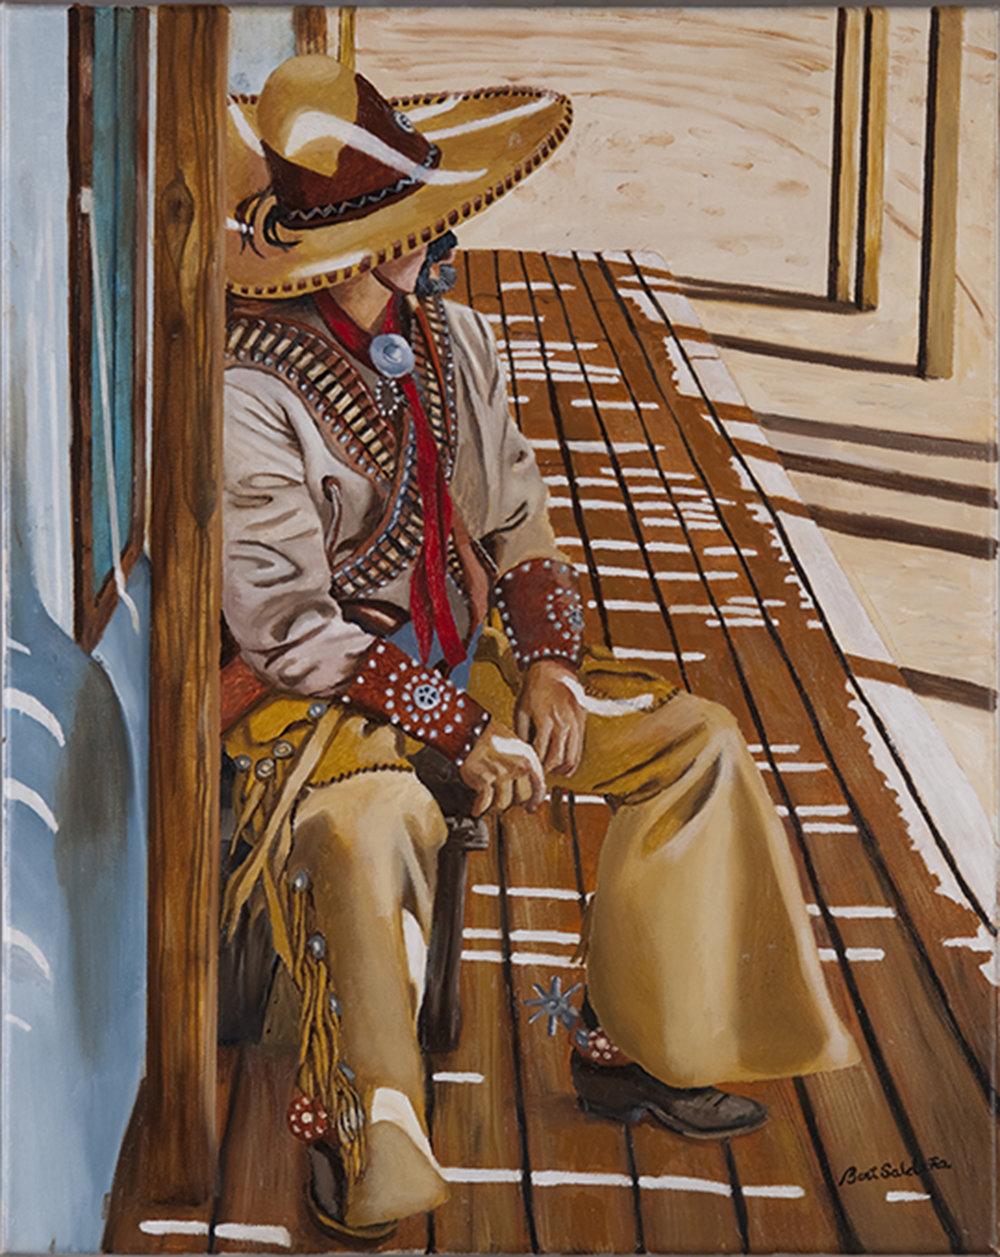 Bert Saldana -- Vaquero